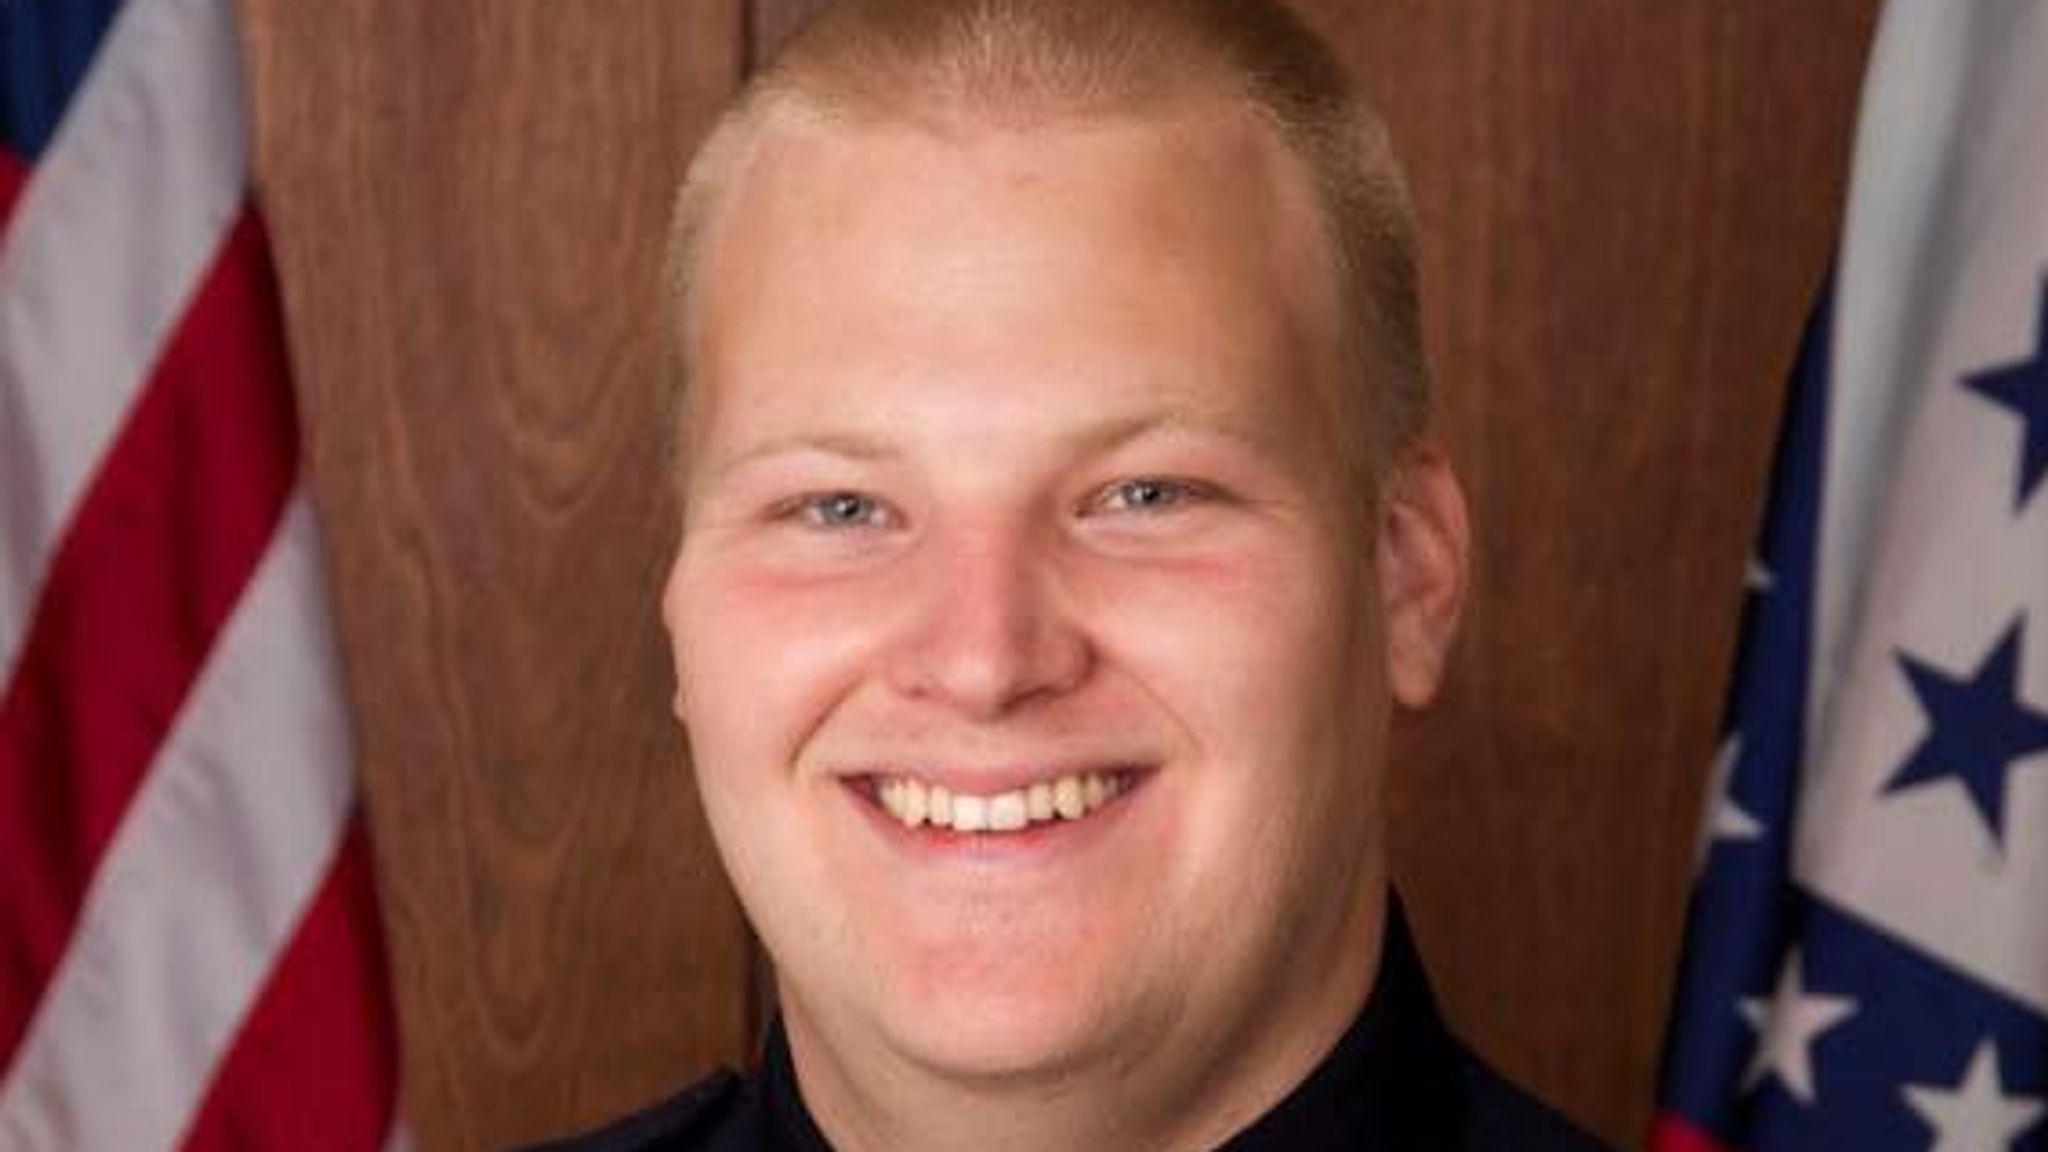 Policeman 'ambushed and executed' in patrol car in Arkansas